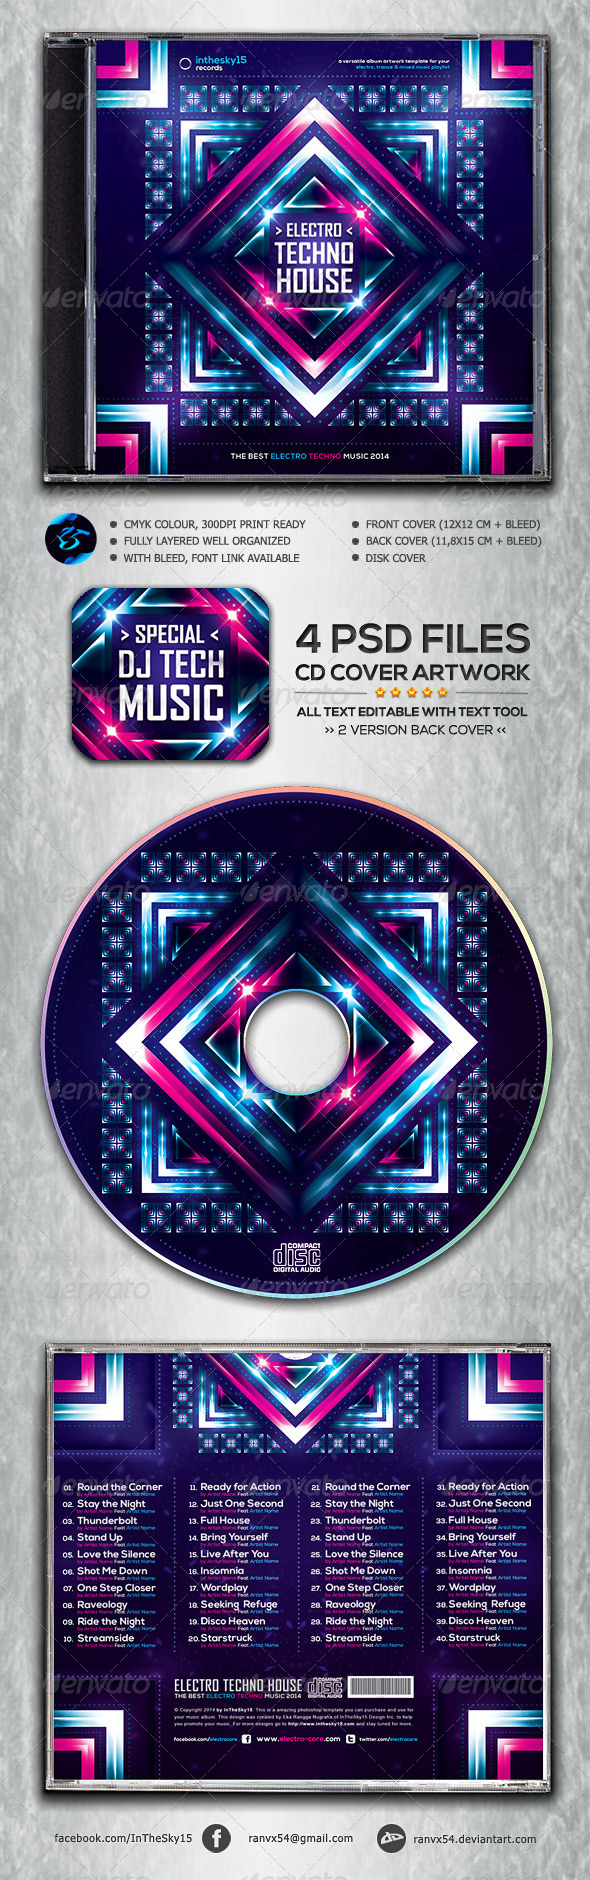 GraphicRiver Electro Techno House CD Album Artwork 6974100